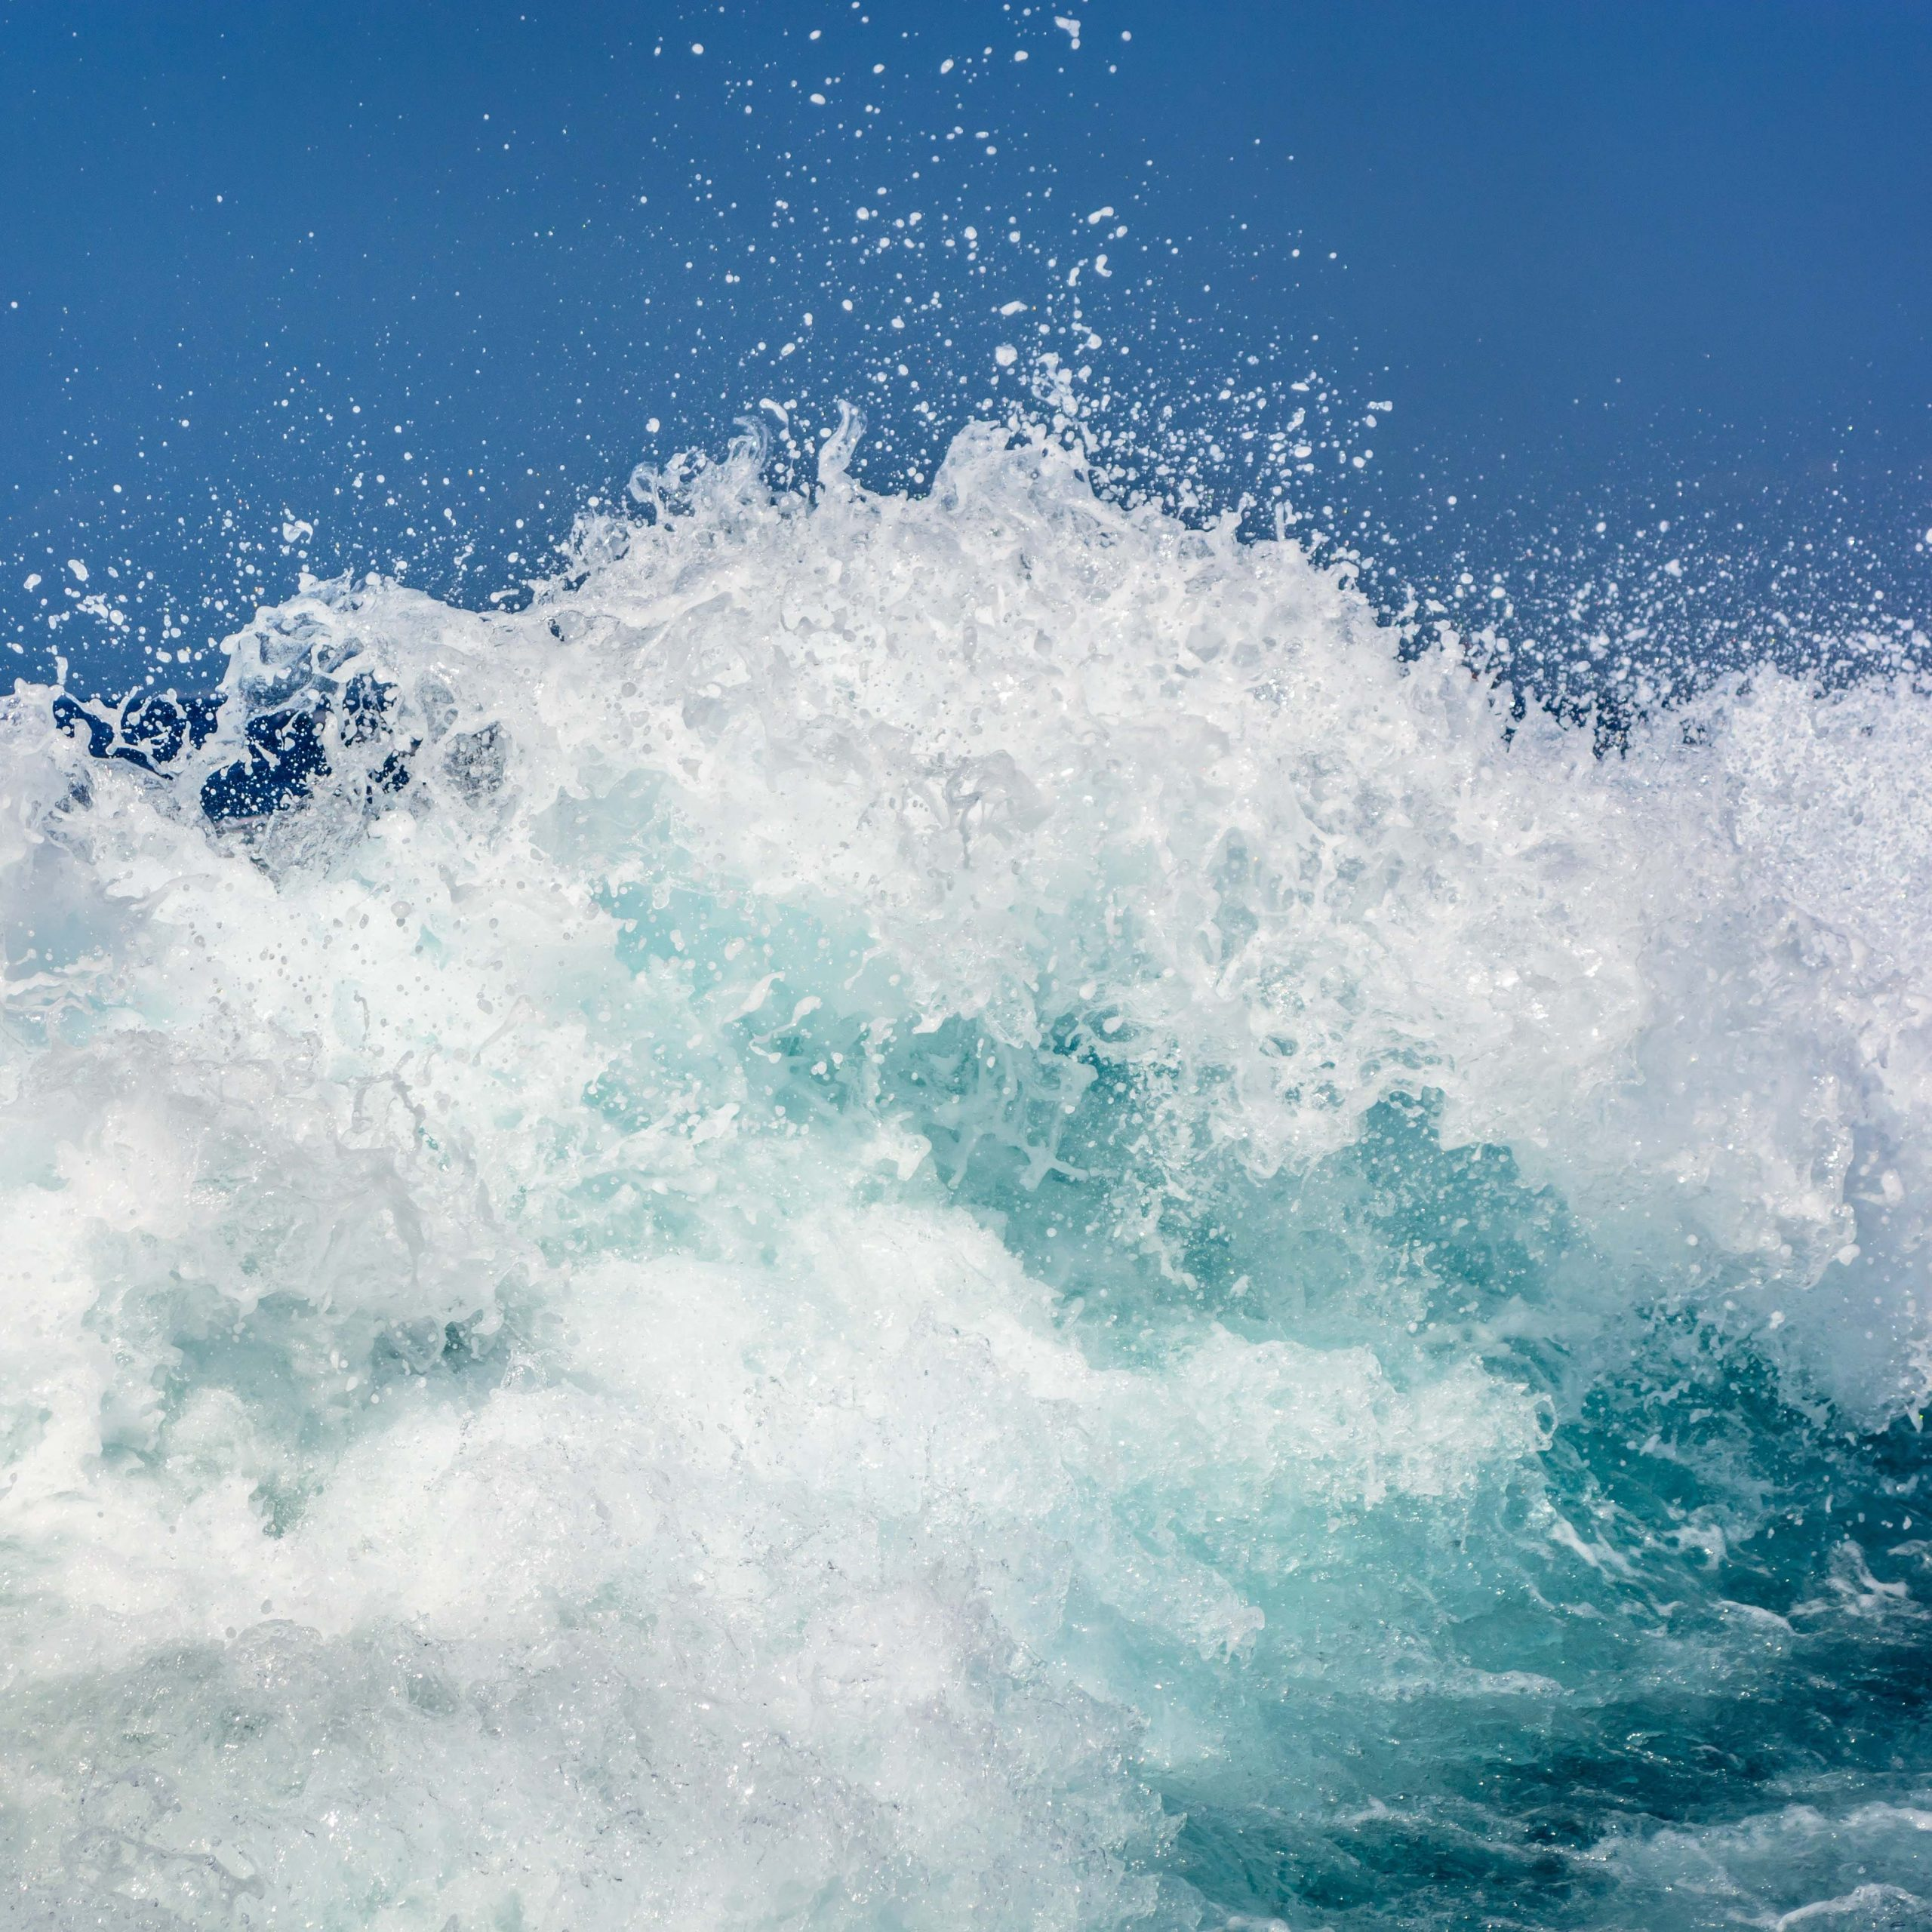 blue-ocean-sea-60004